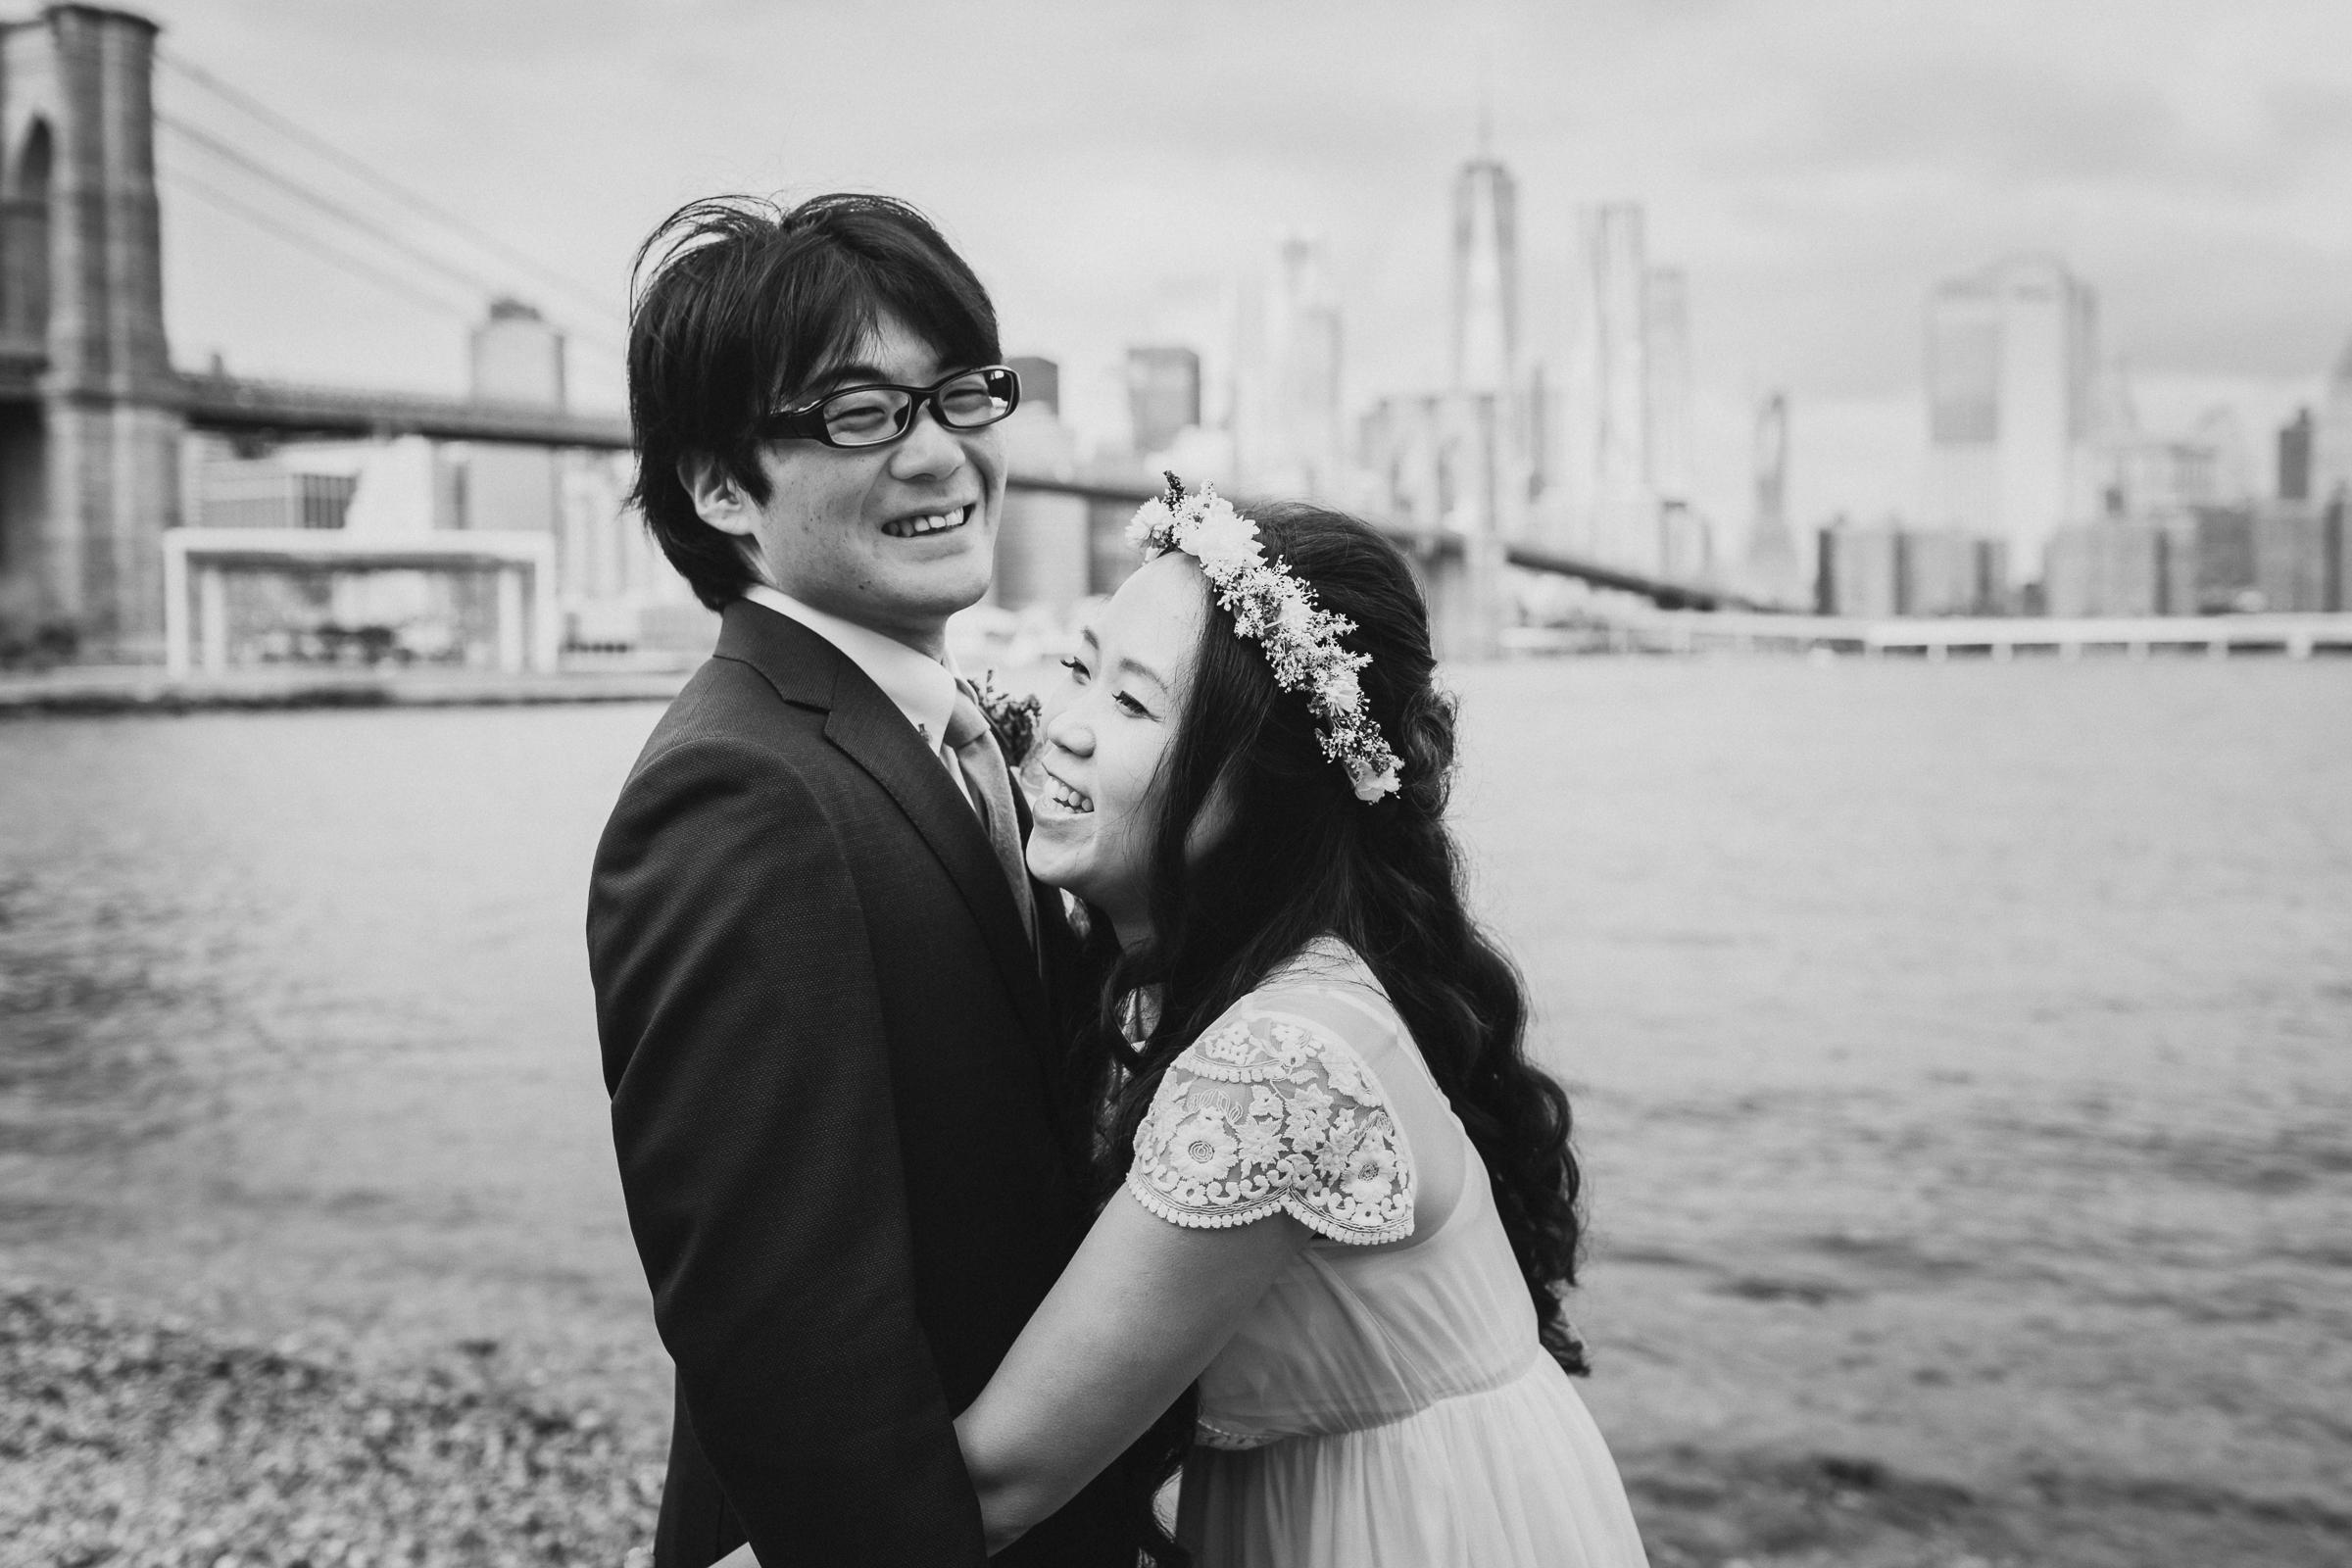 Central-Park-Brooklyn-Bridge-Dumbo-NYC-Documentary-Wedding-Photographer-8.jpg